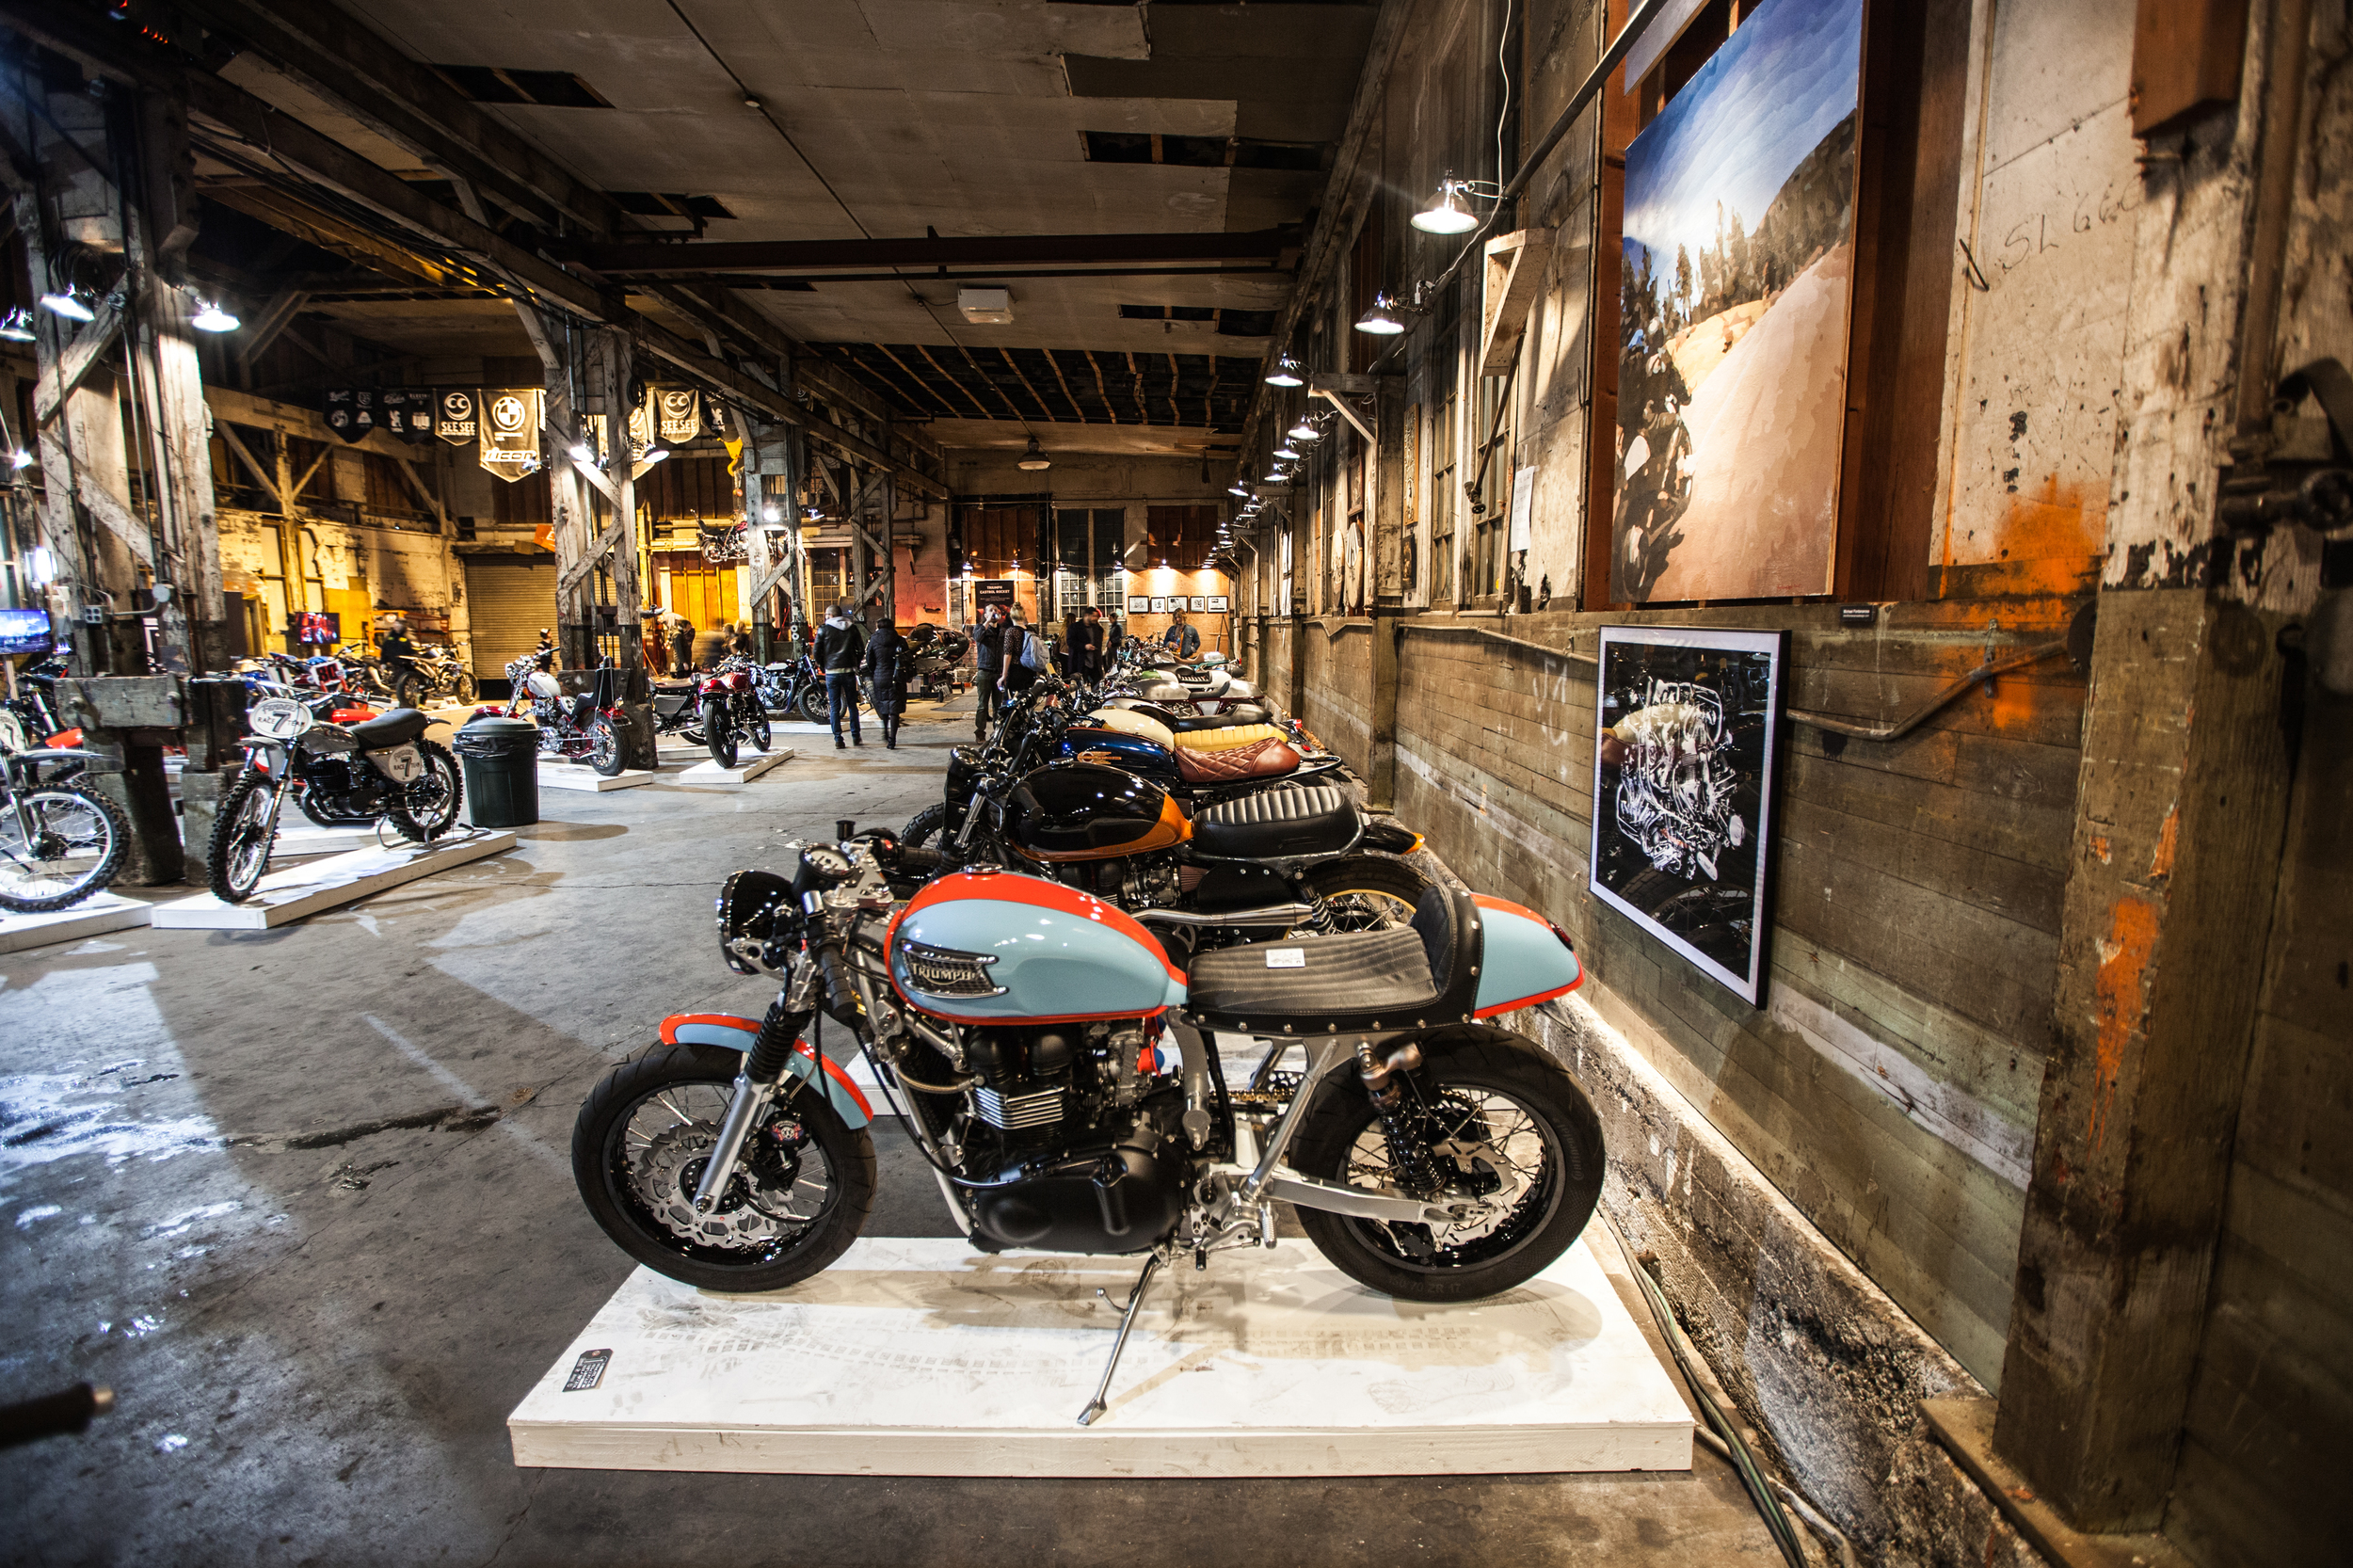 02-14-15 The 1 Moto Show - 2_-54-30.jpg